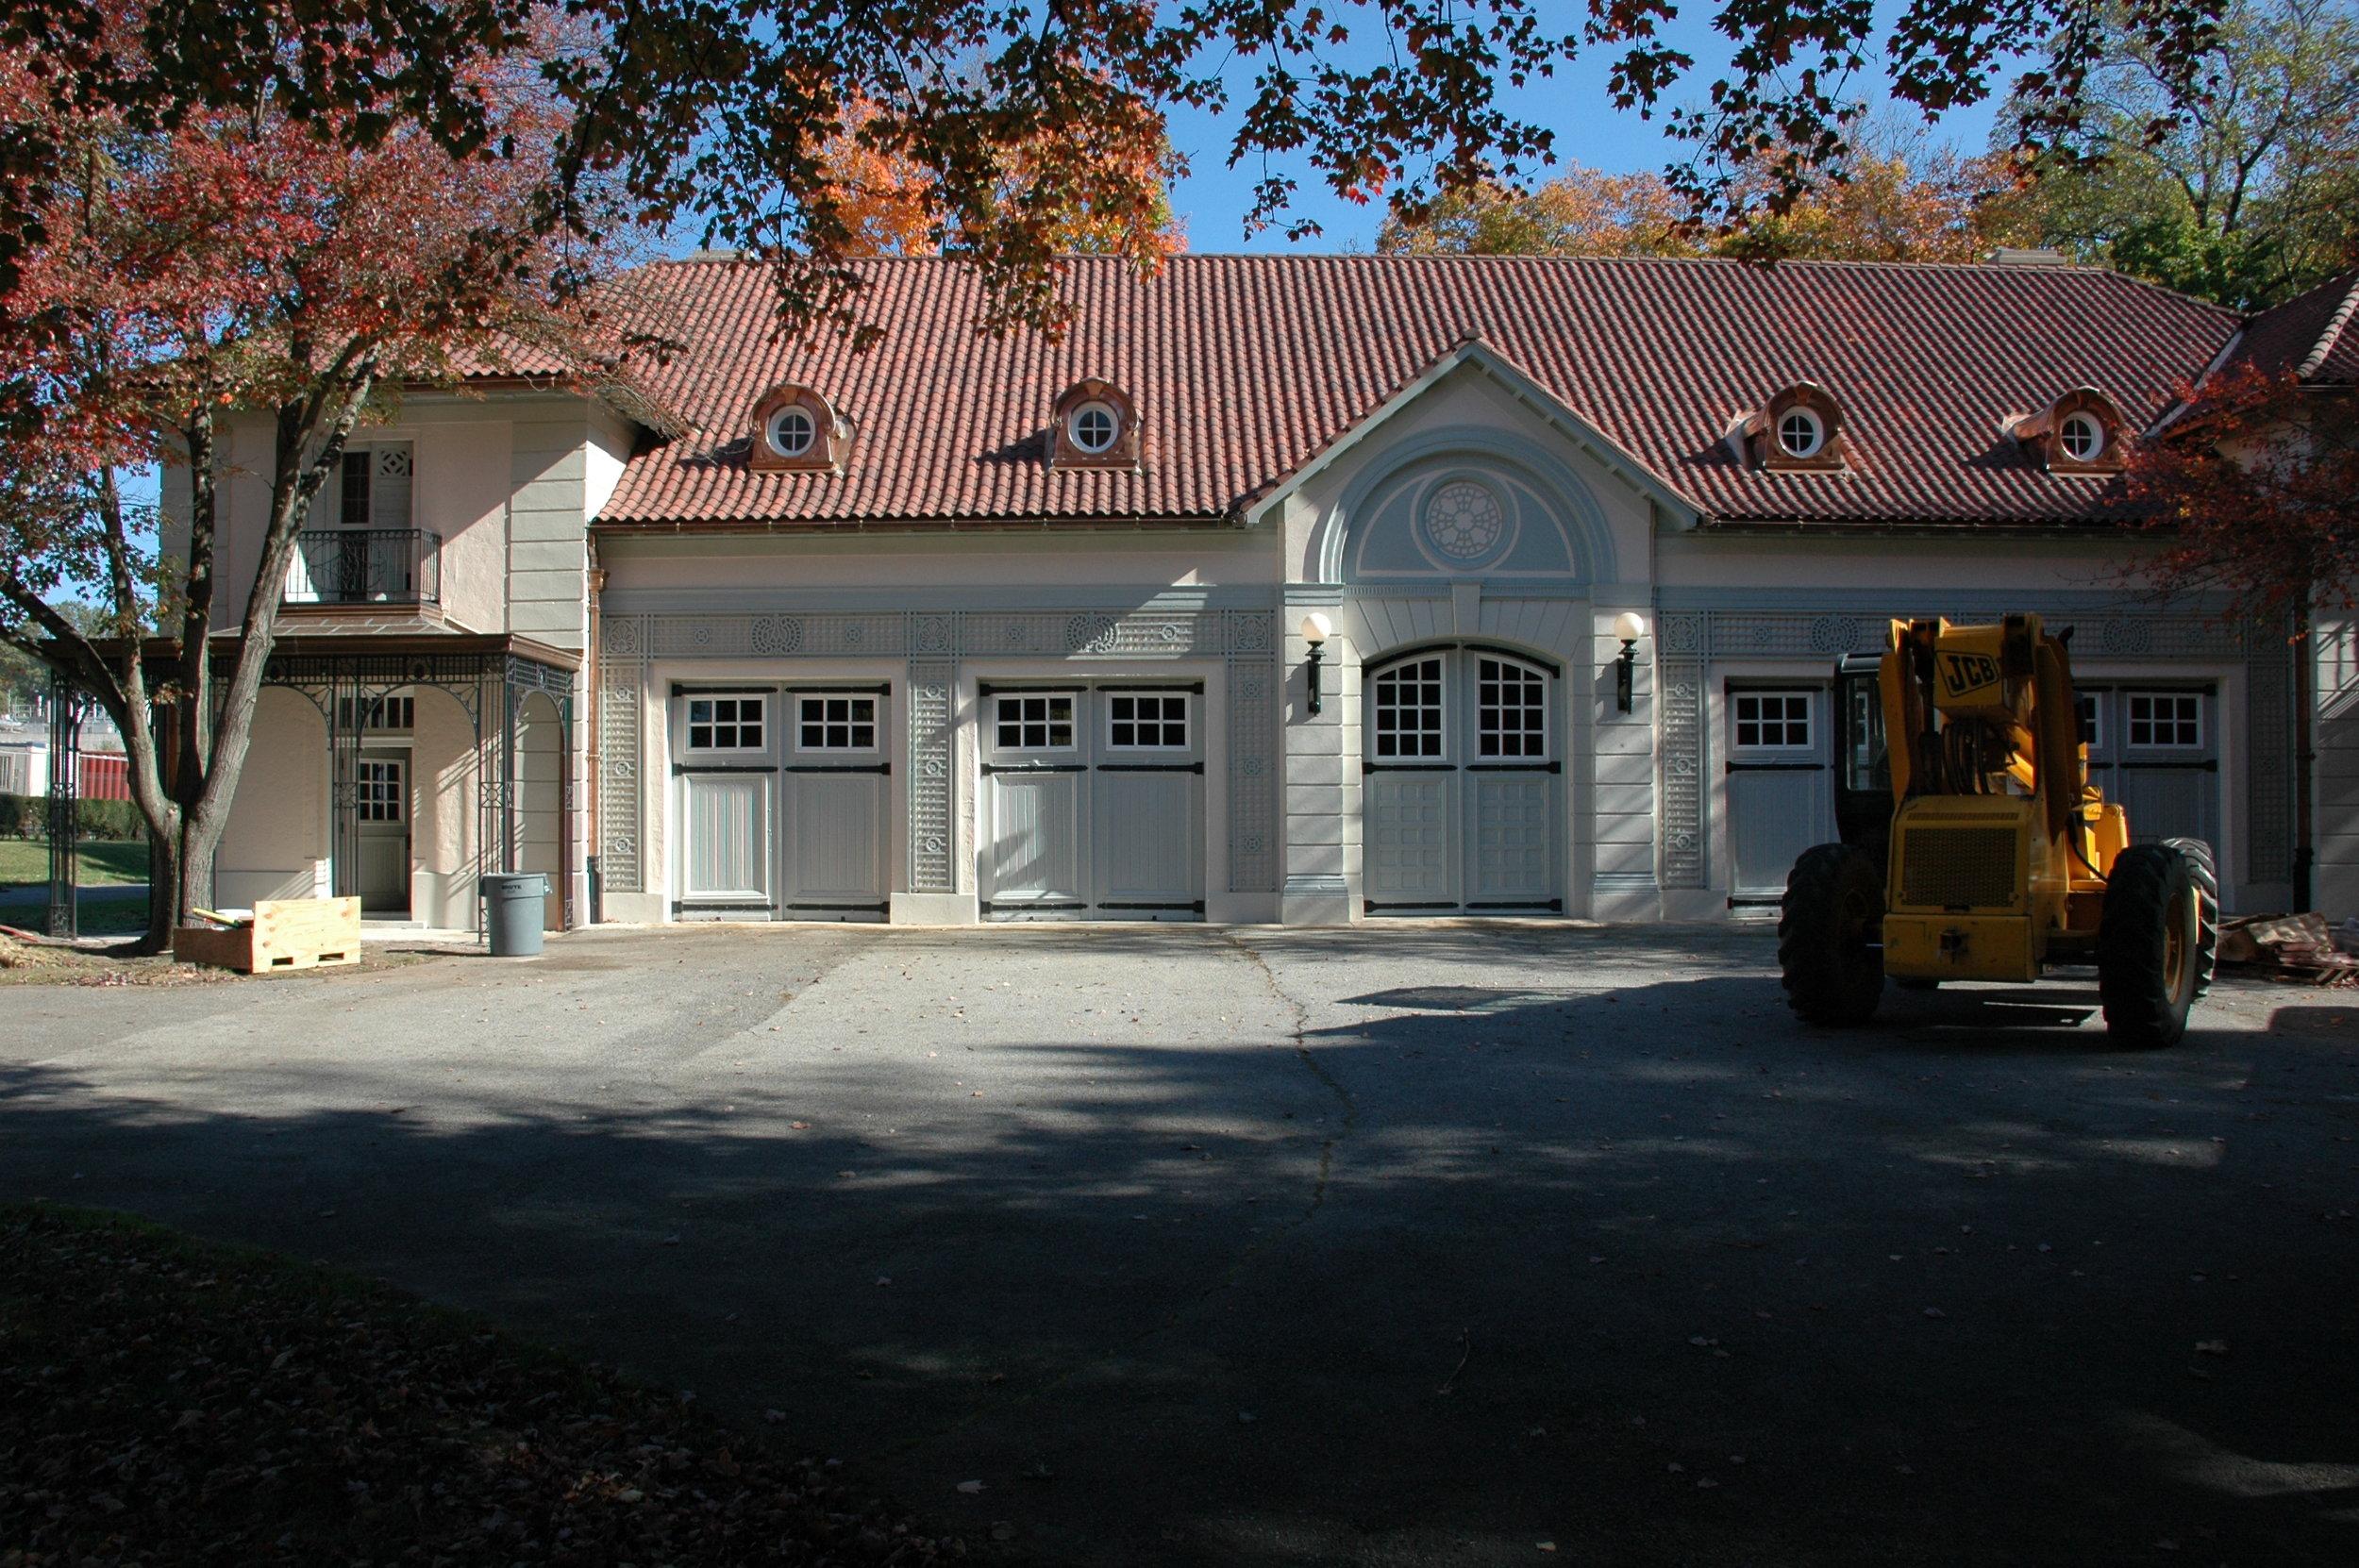 Nemours Chaffeurs garage